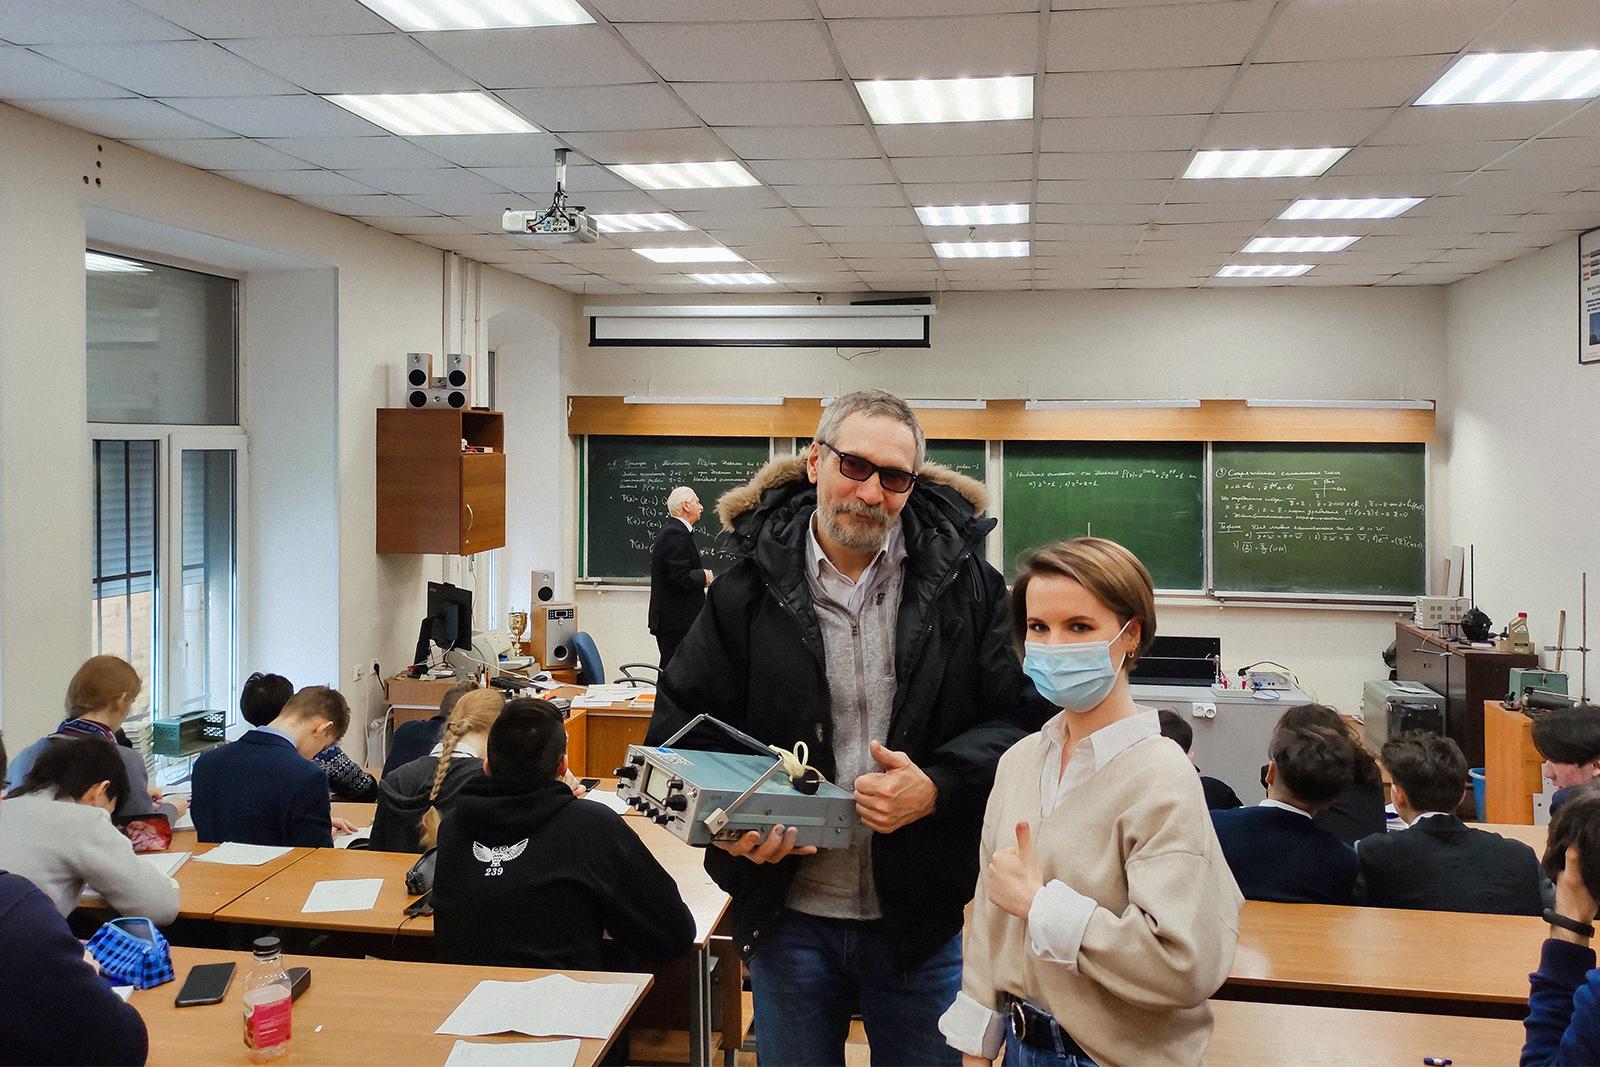 ВШТМ передала Президентскому ФМЛ №239 осциллографы